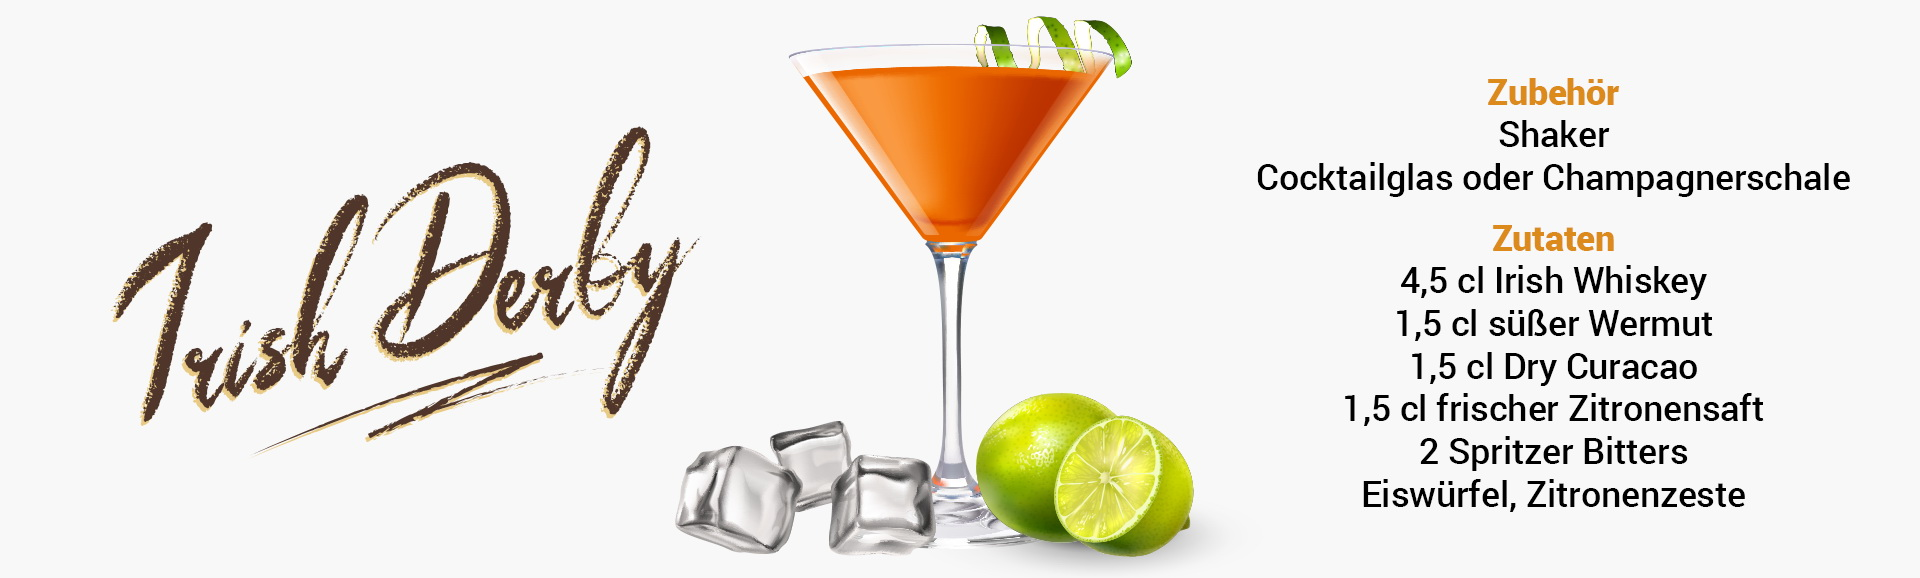 Whisky Cocktail: Irish Derby Rezept + Tipp